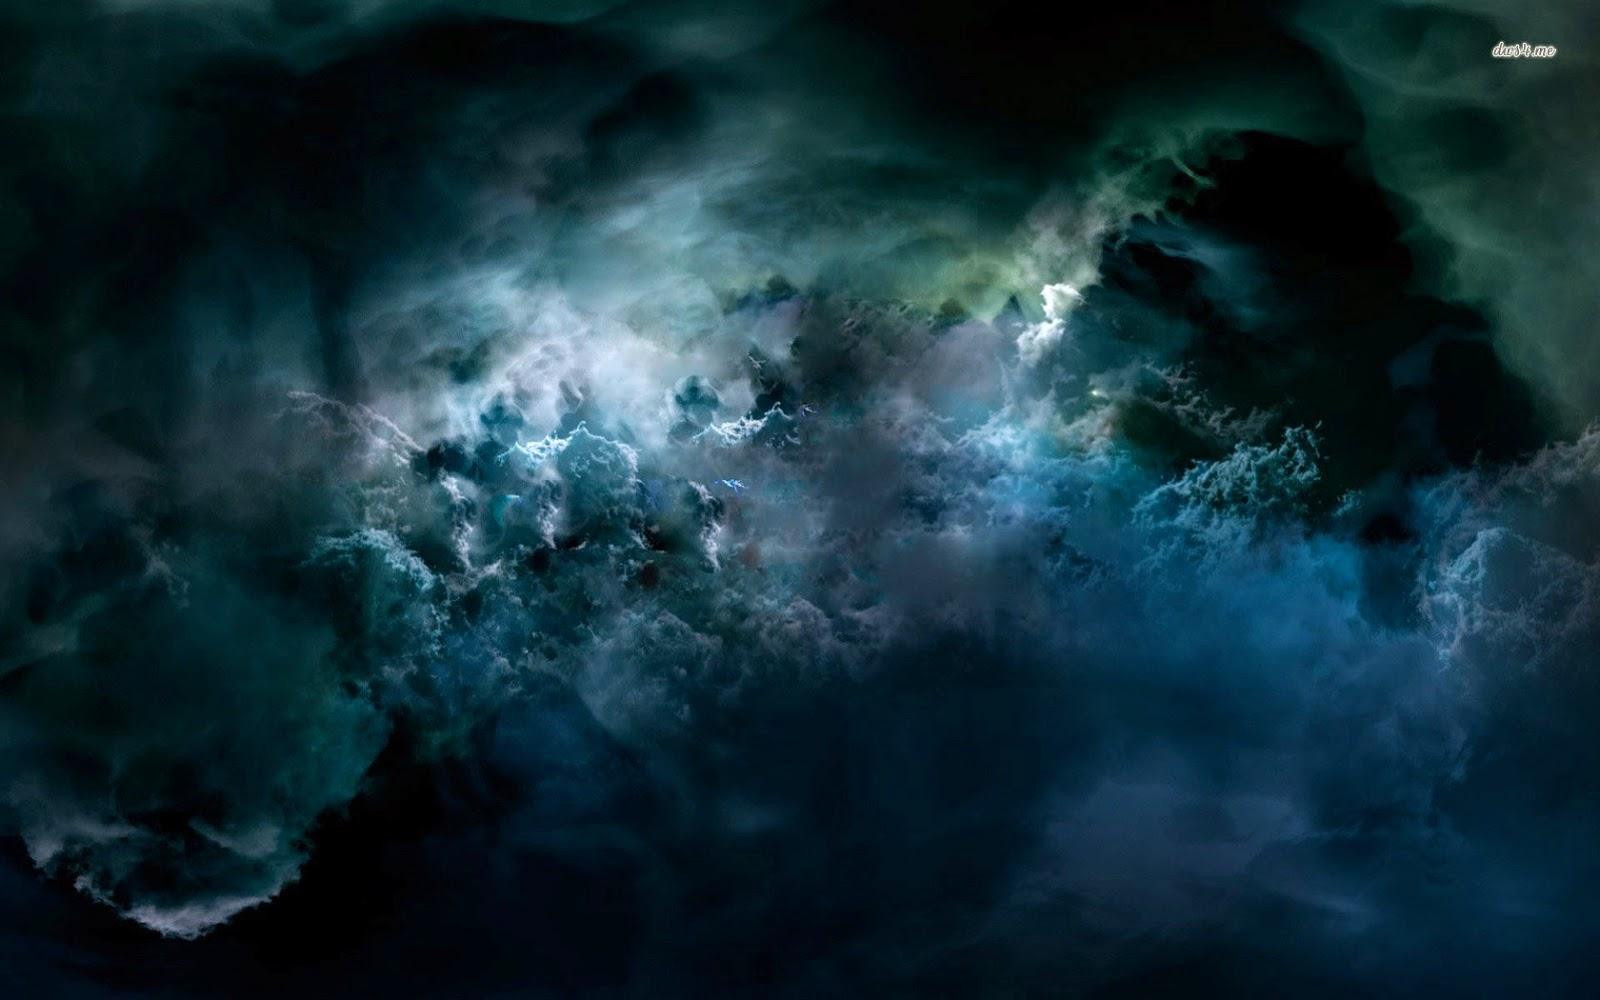 Dark Mark Harry Potter Wallpaper Imaginarium Dark Clouds